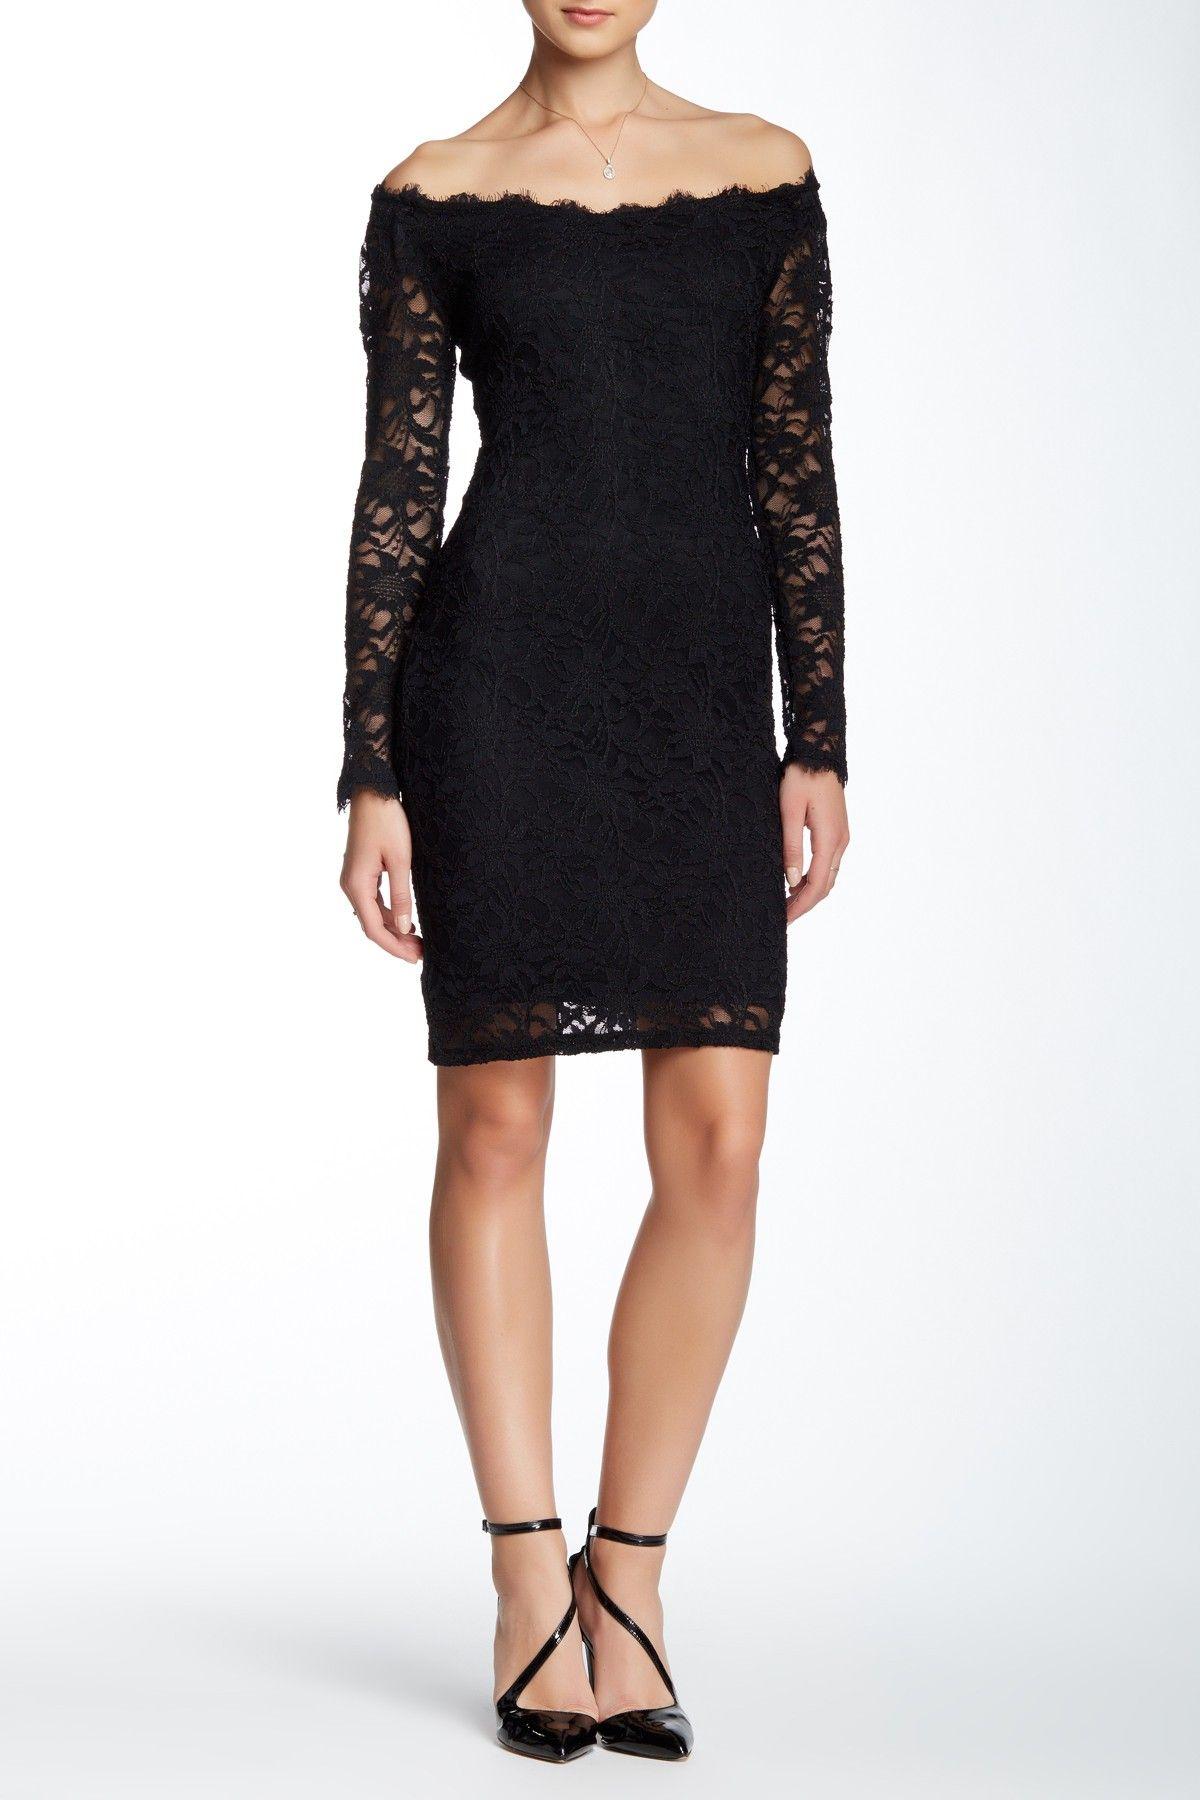 Marina Off The Shoulder Lace Dress Nordstrom Rack Off Shoulder Lace Dress Lace Dress Dresses [ 1800 x 1200 Pixel ]